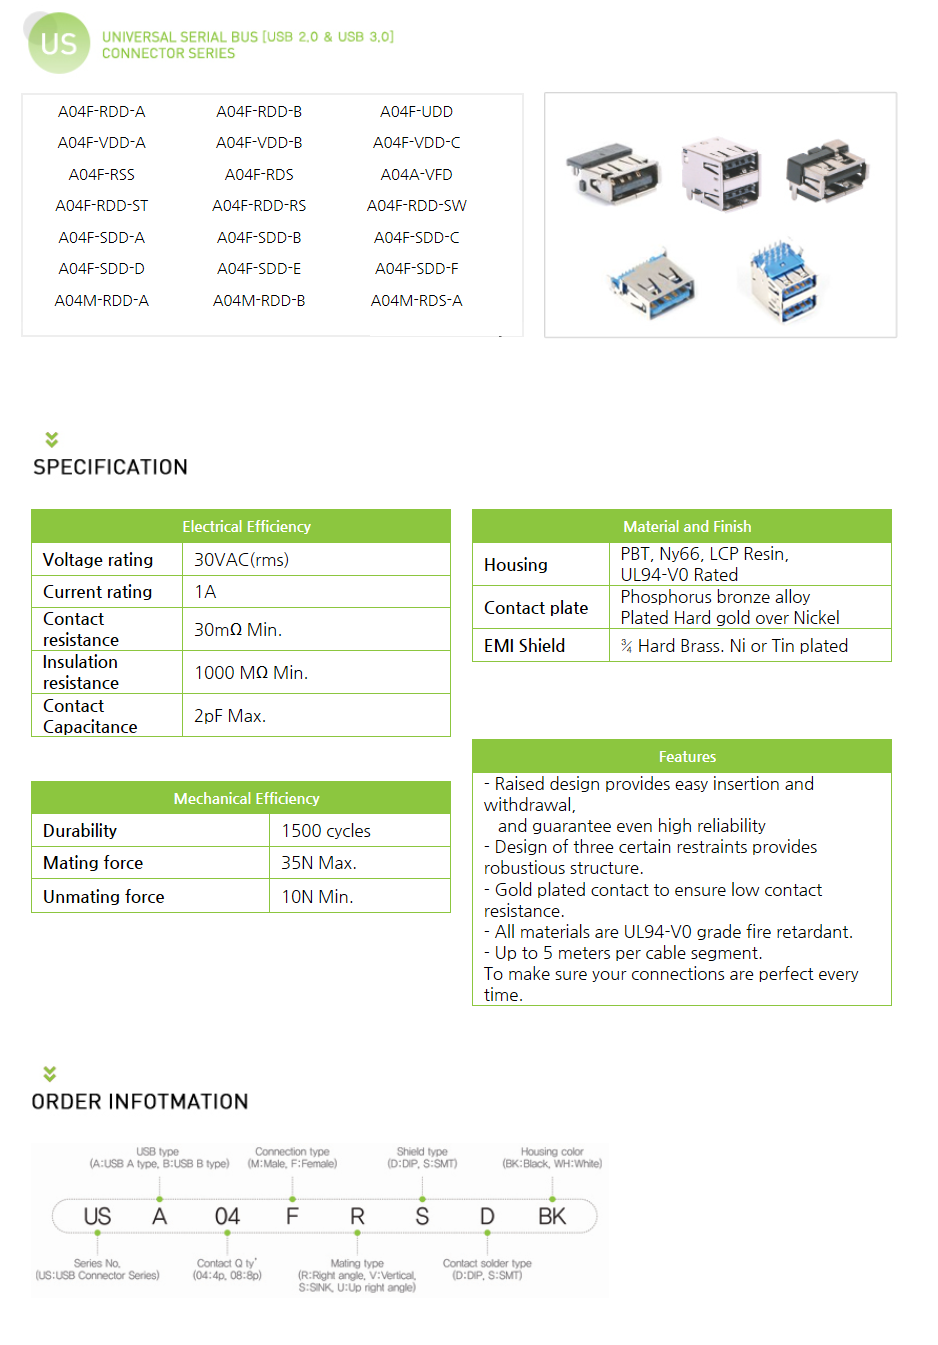 ARINTECH Universal Serial Bus Connector (US)